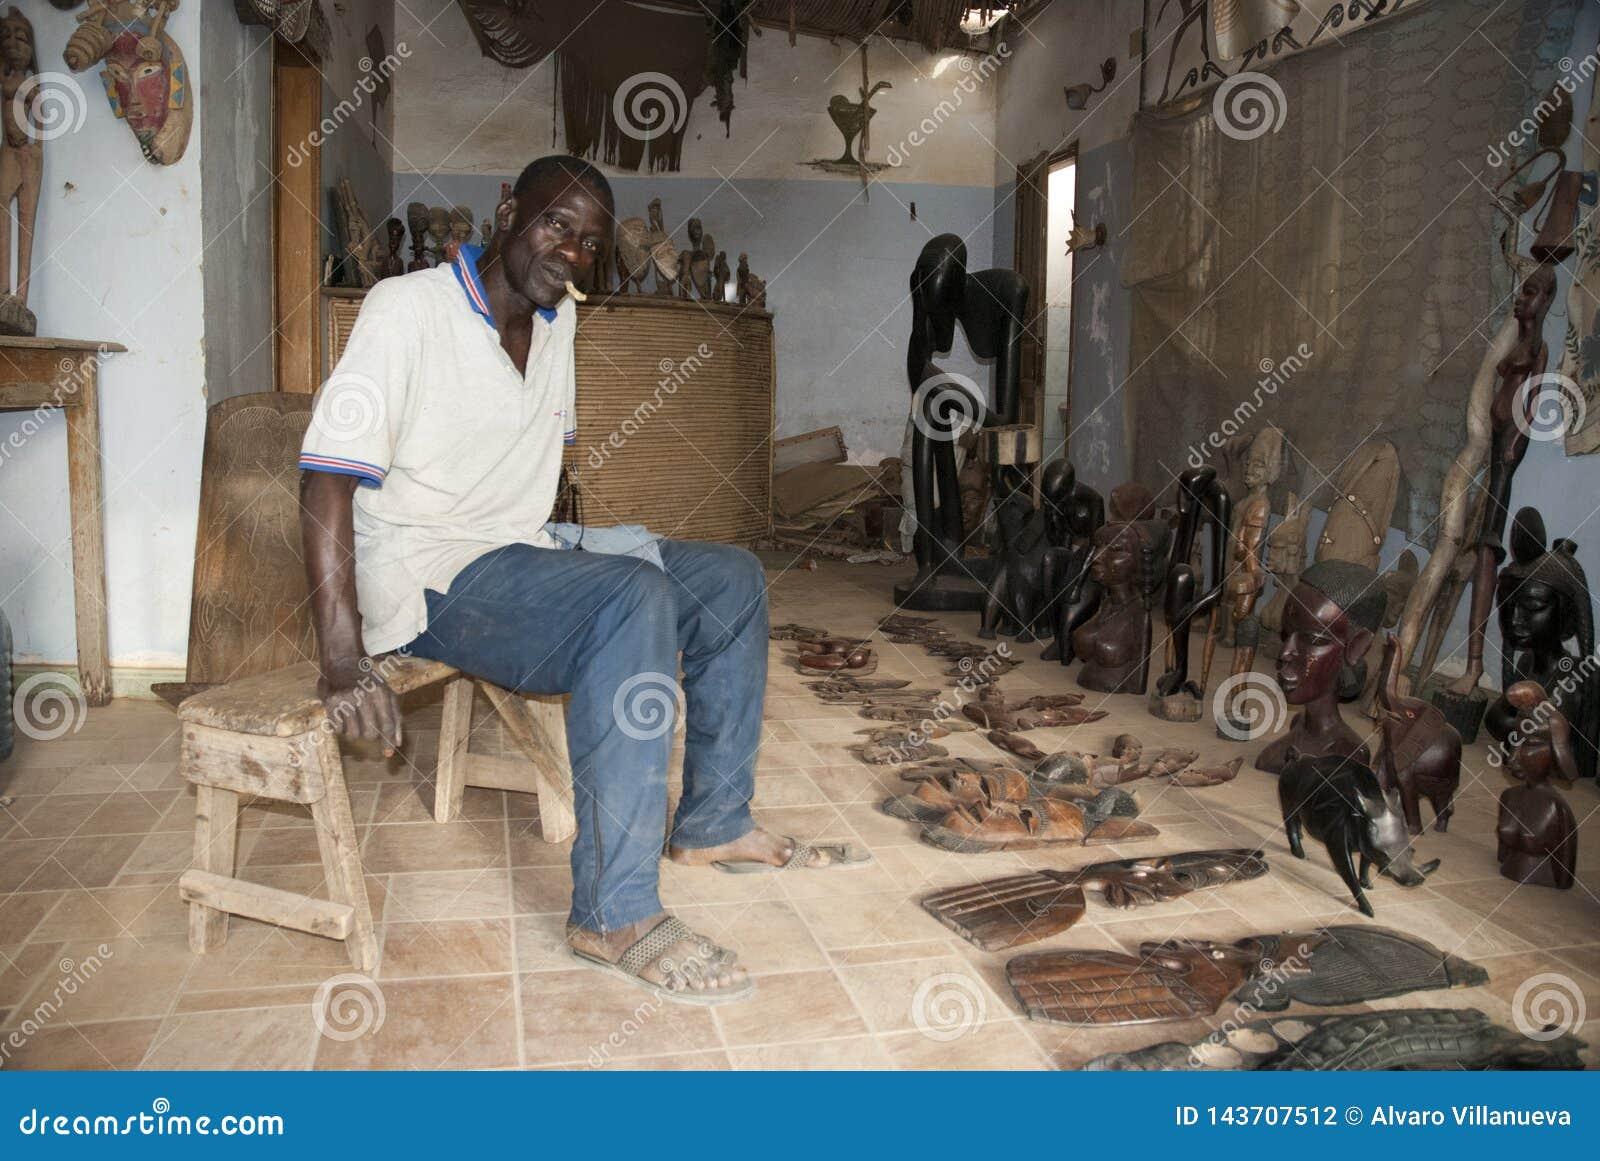 Mbour, Senegal, handcrafts seller posing inside his small shop